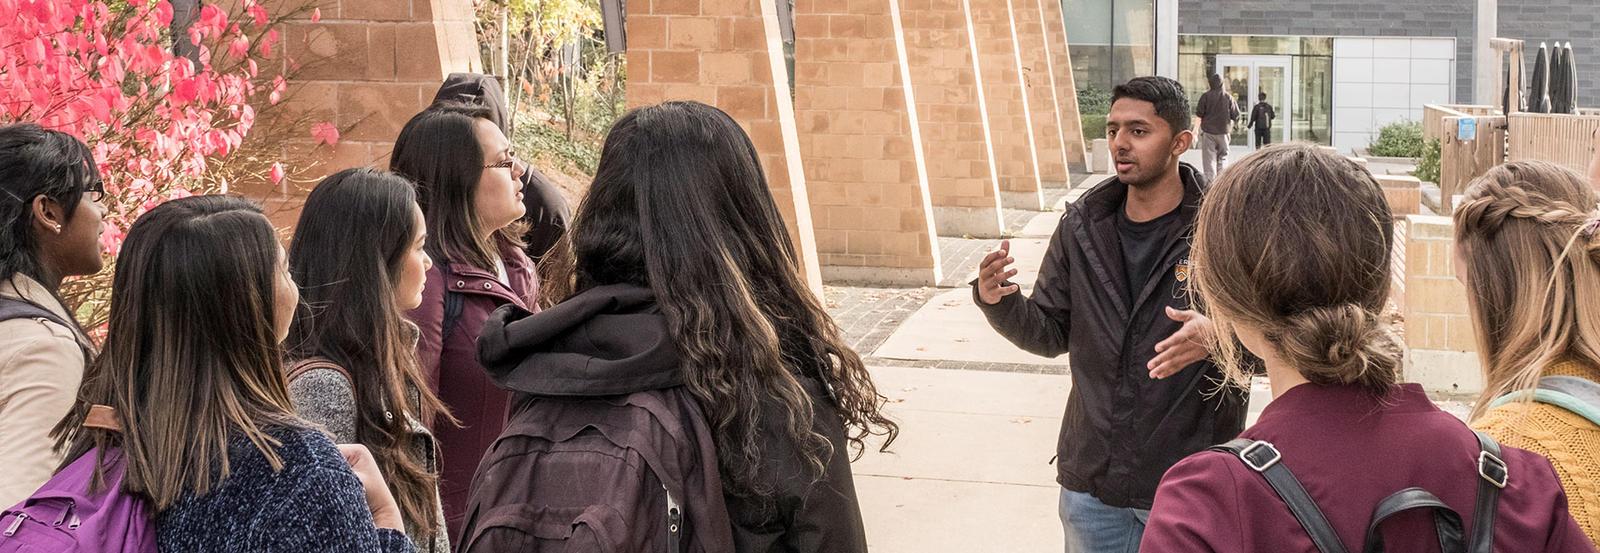 Students take tour